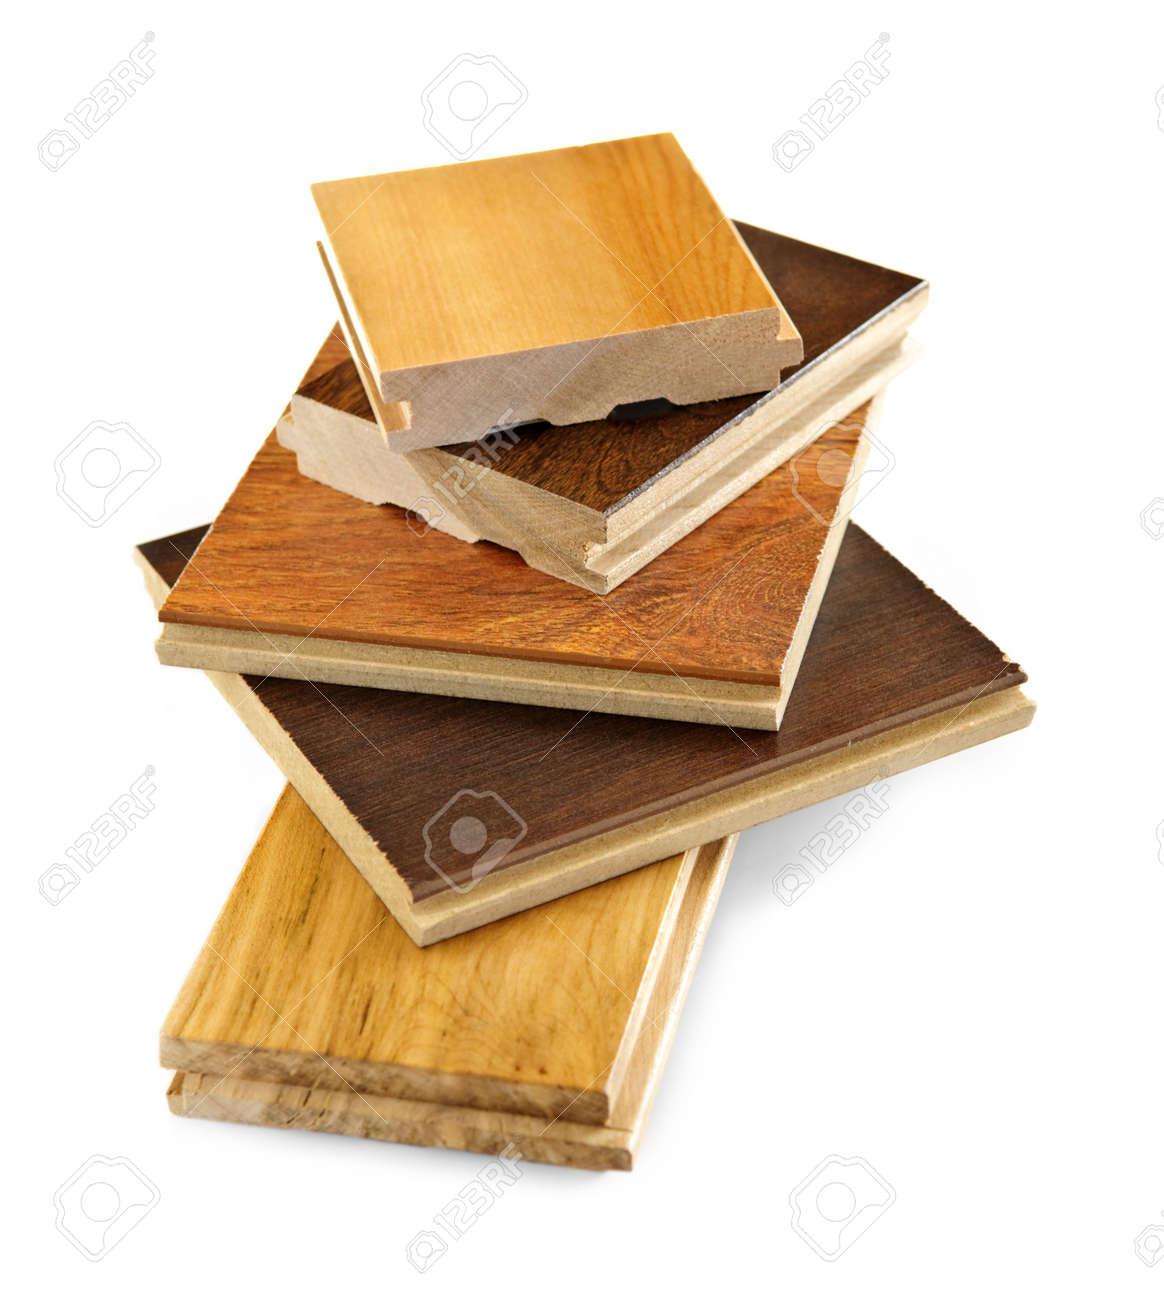 Hardwood Floor Samples incredible hardwood floor samples hardwood floor samples Isolated Stacked Prefinished Hardwood Flooring Samples Stock Photo 4861971